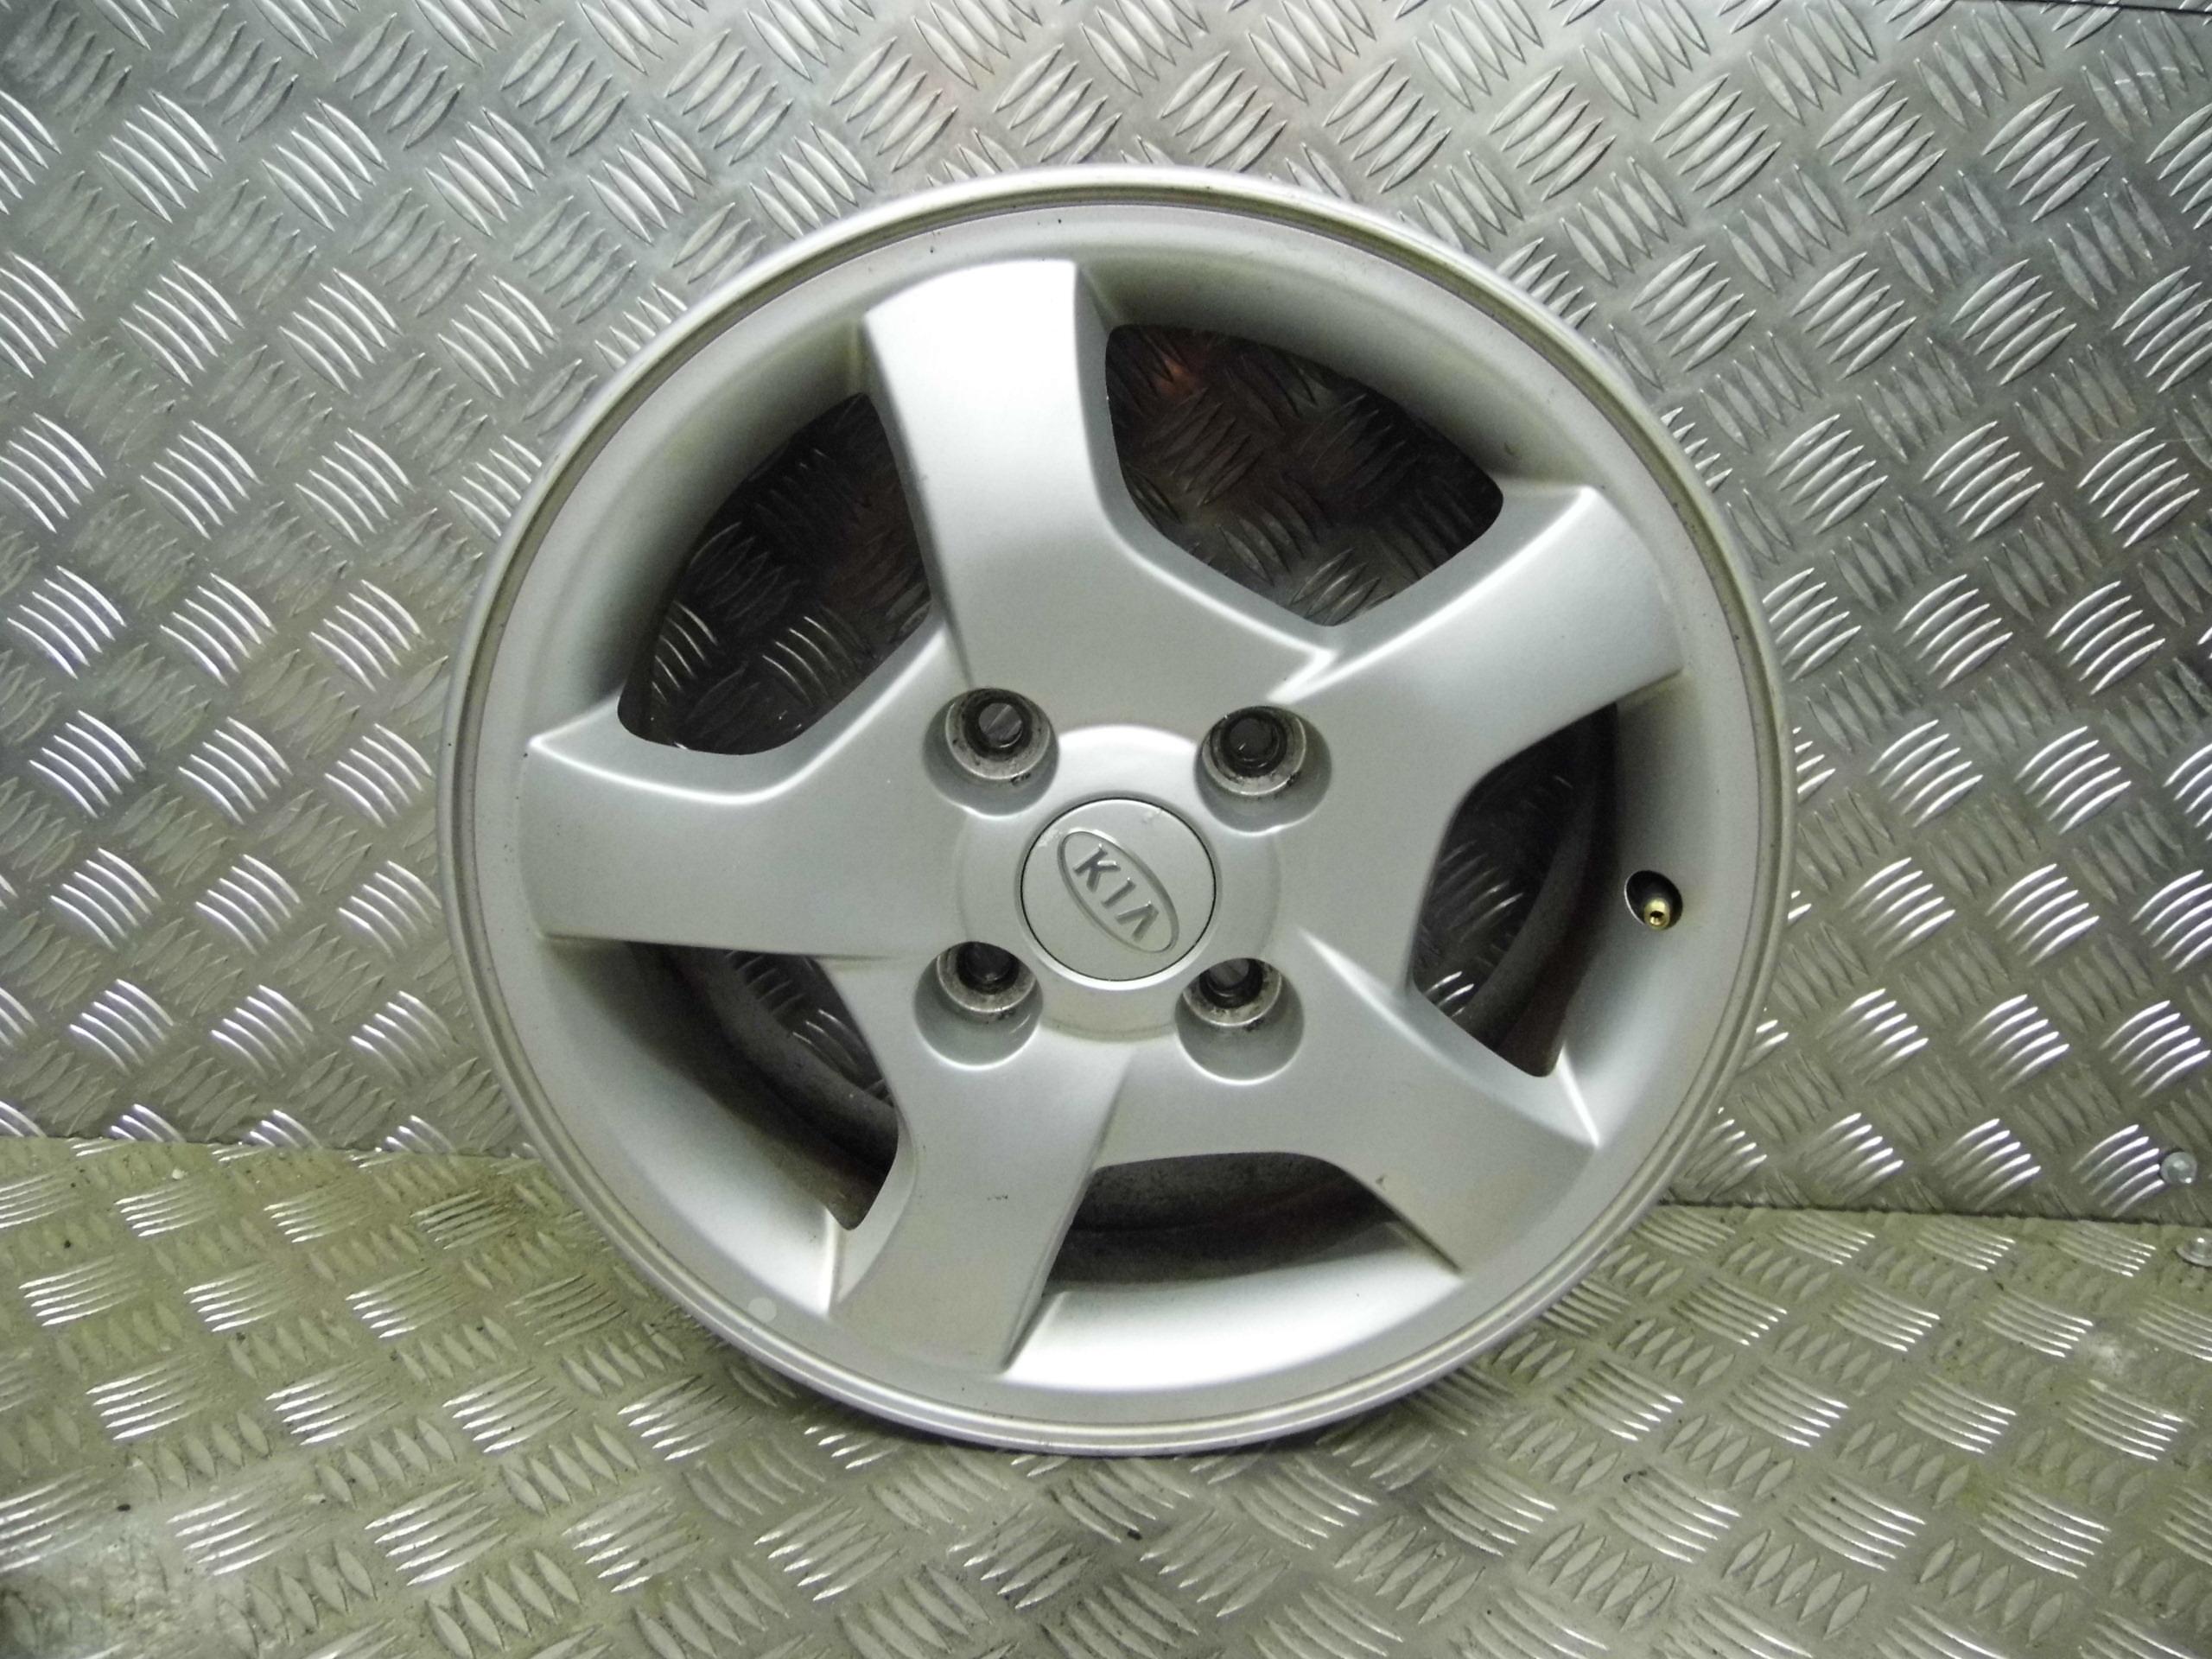 Used 2006 56 Kia Cerato 6j X 15 Inch 4 Stud Alloy Wheel Fuse Box Location